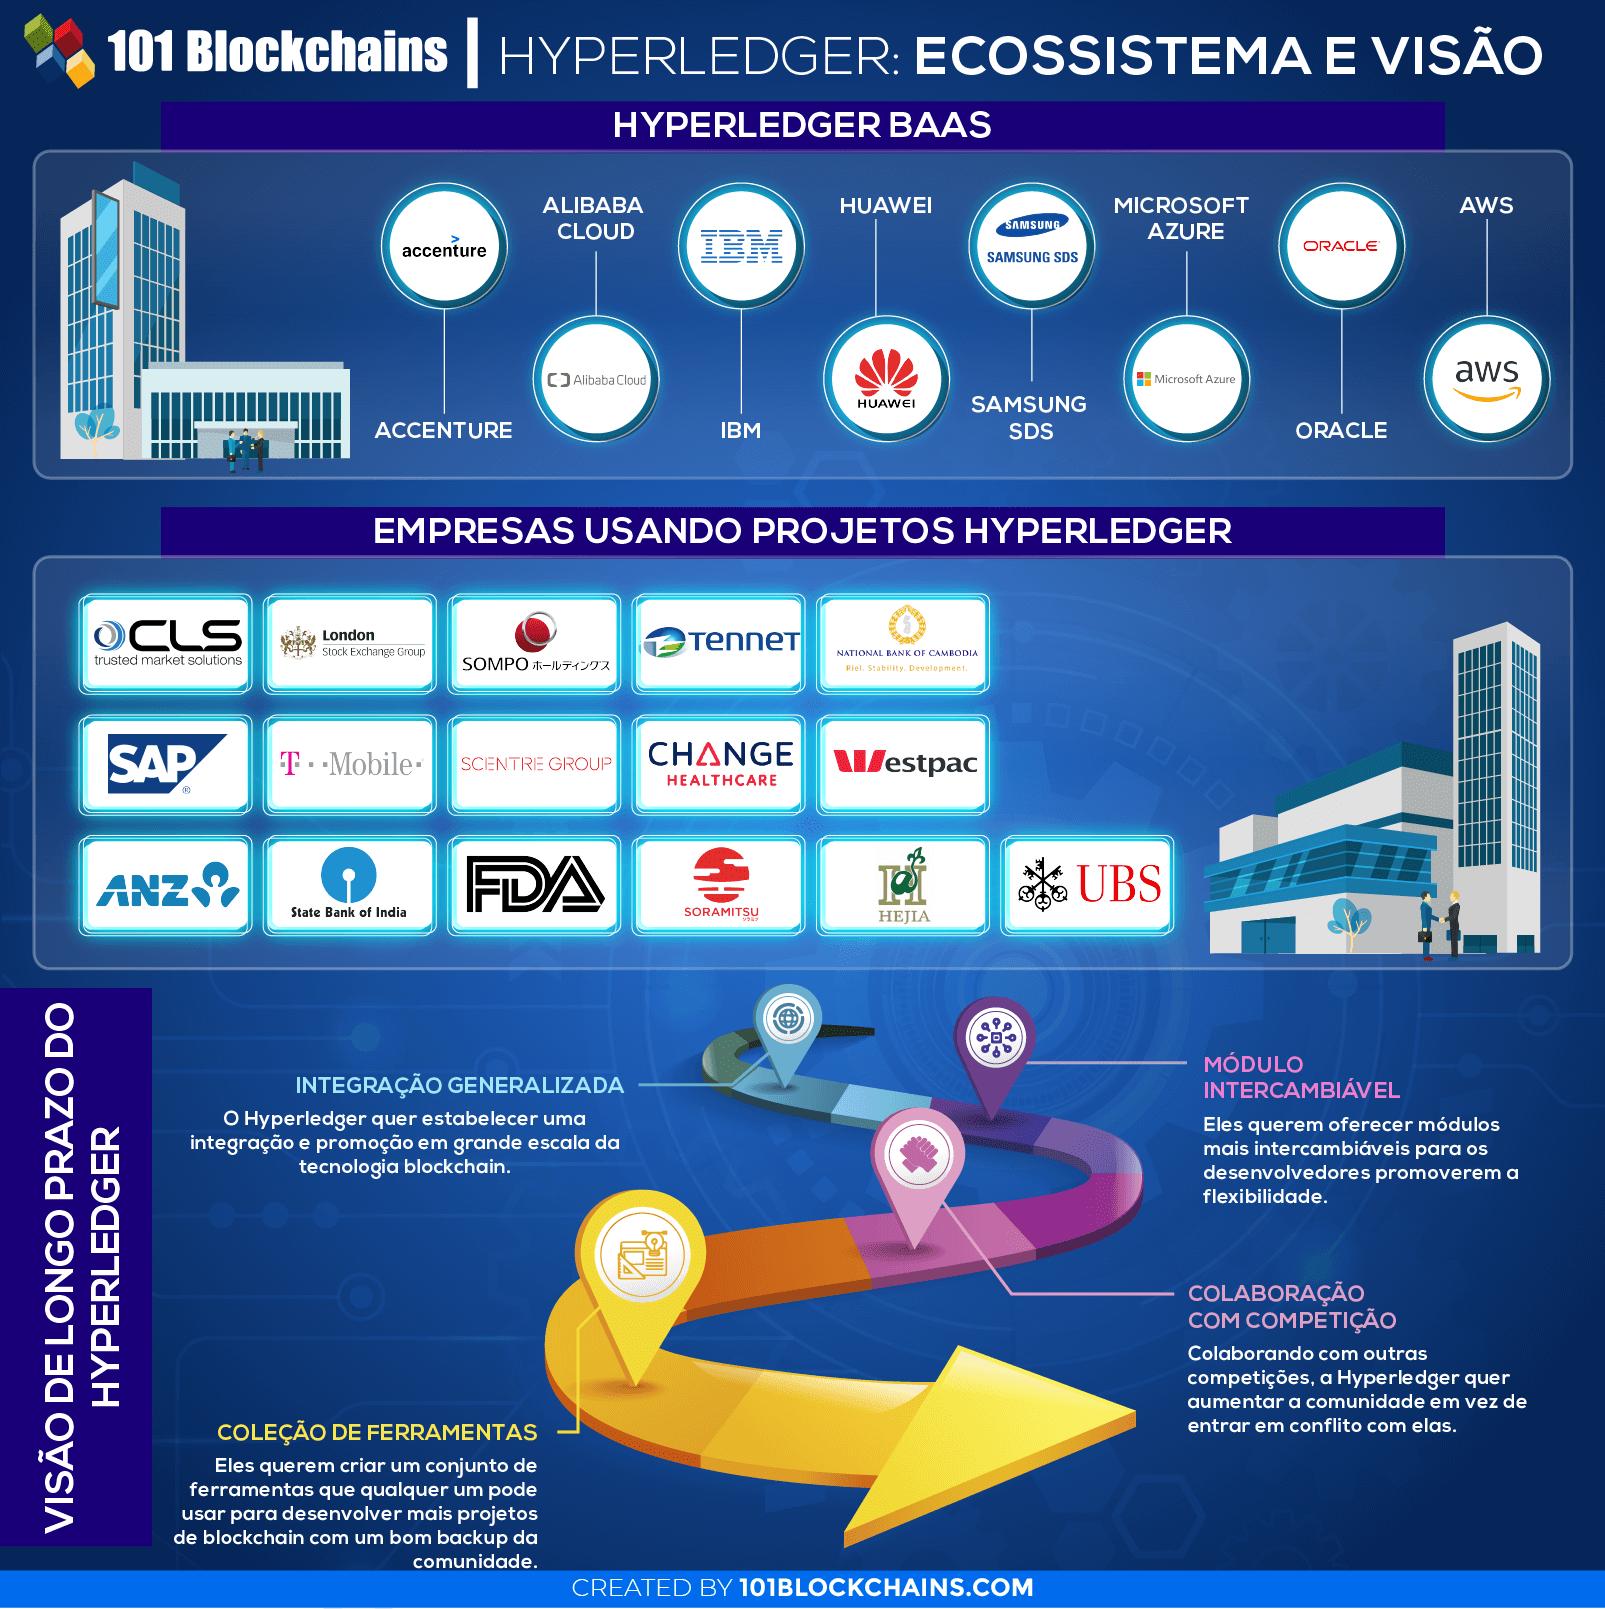 Hyperledger - Ecossistema e Vis¦o